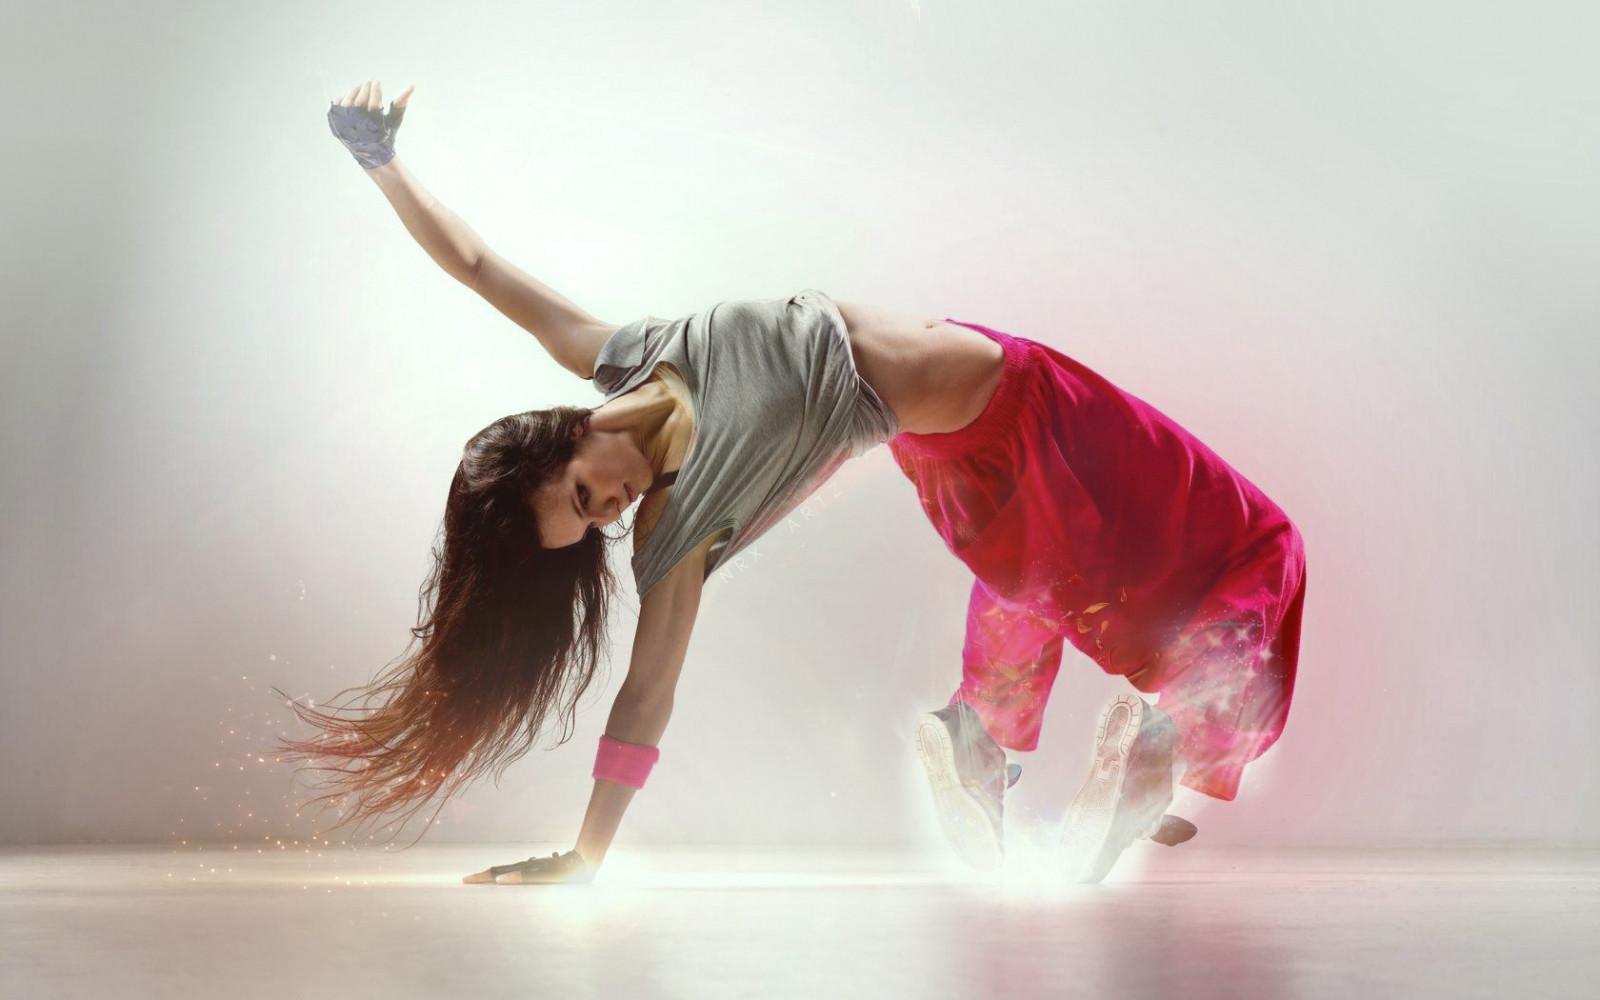 Ballet Dance Wallpapers Hd Resolution Dodskypict: Wallpaper : Sports, Dancing, Music, Dancer, Ballet, Play